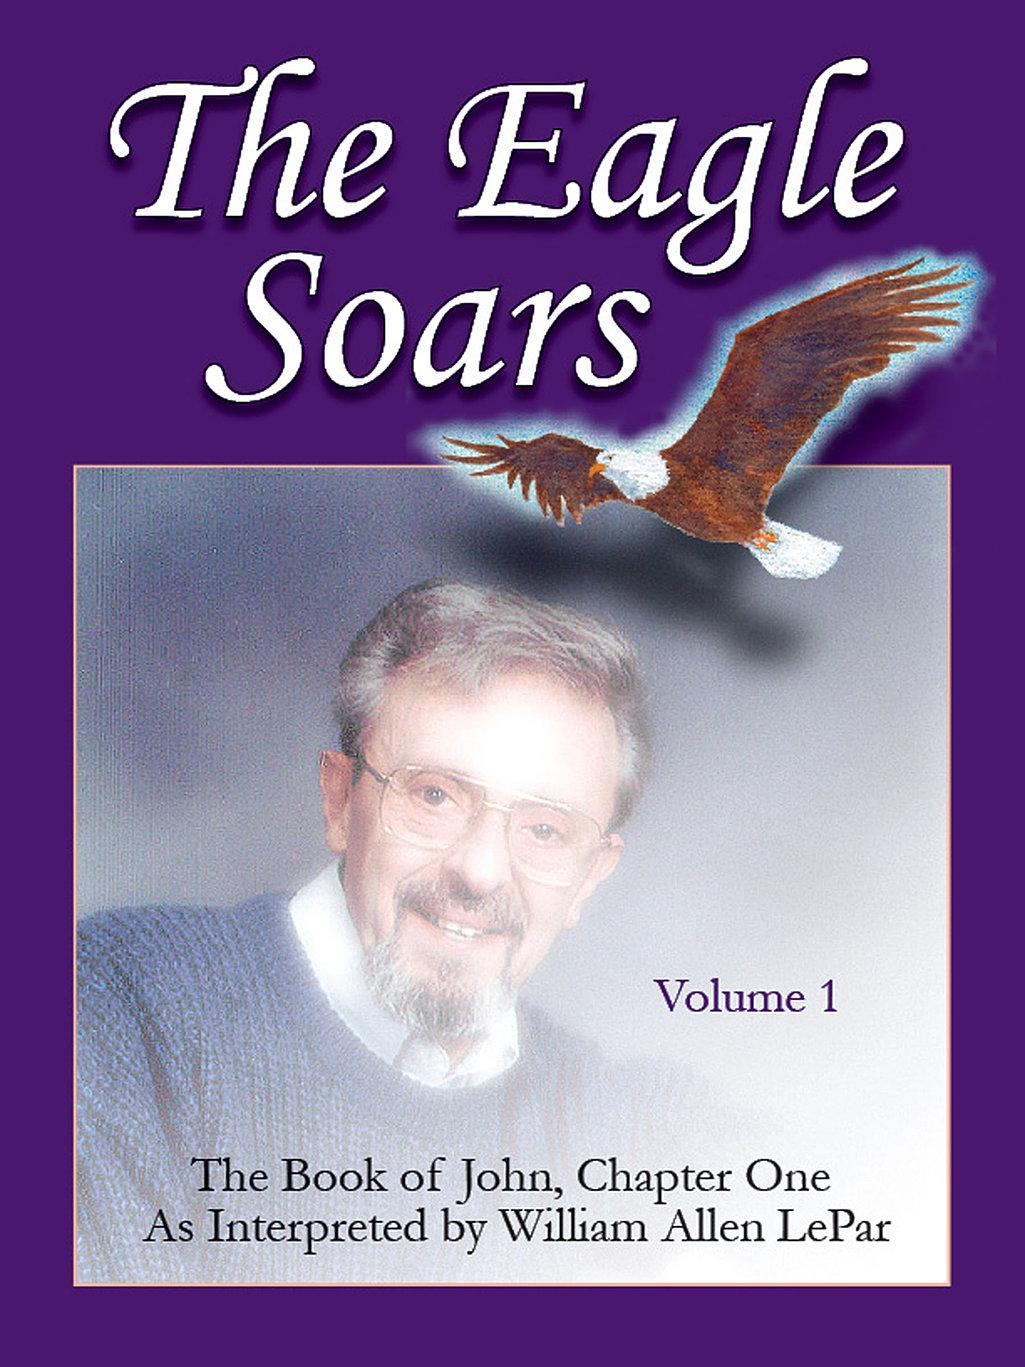 The Eagle Soars - Vol. 1